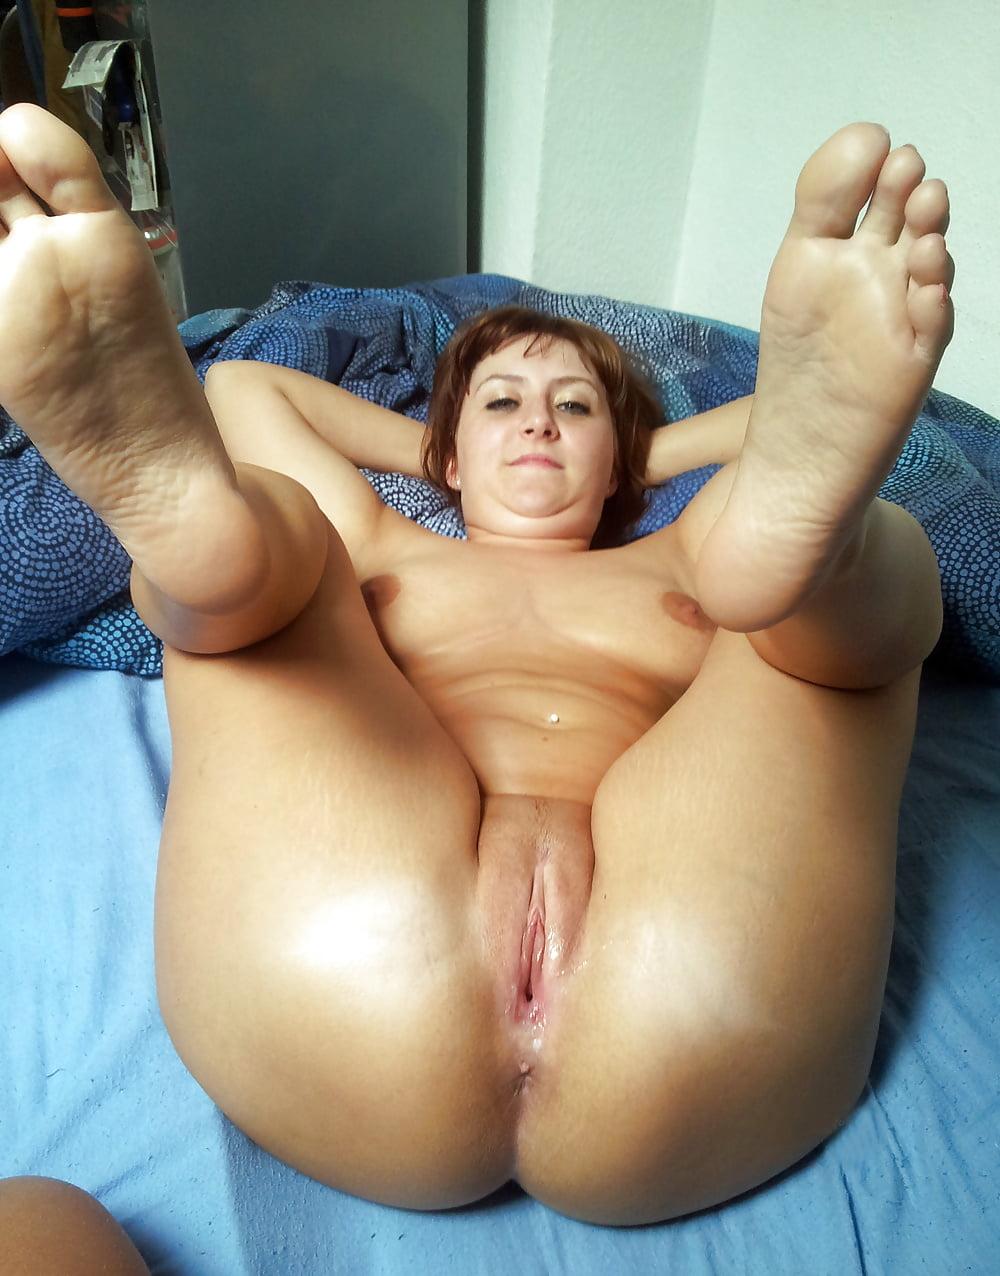 Chubby milf feet, videos of boys fucking girls